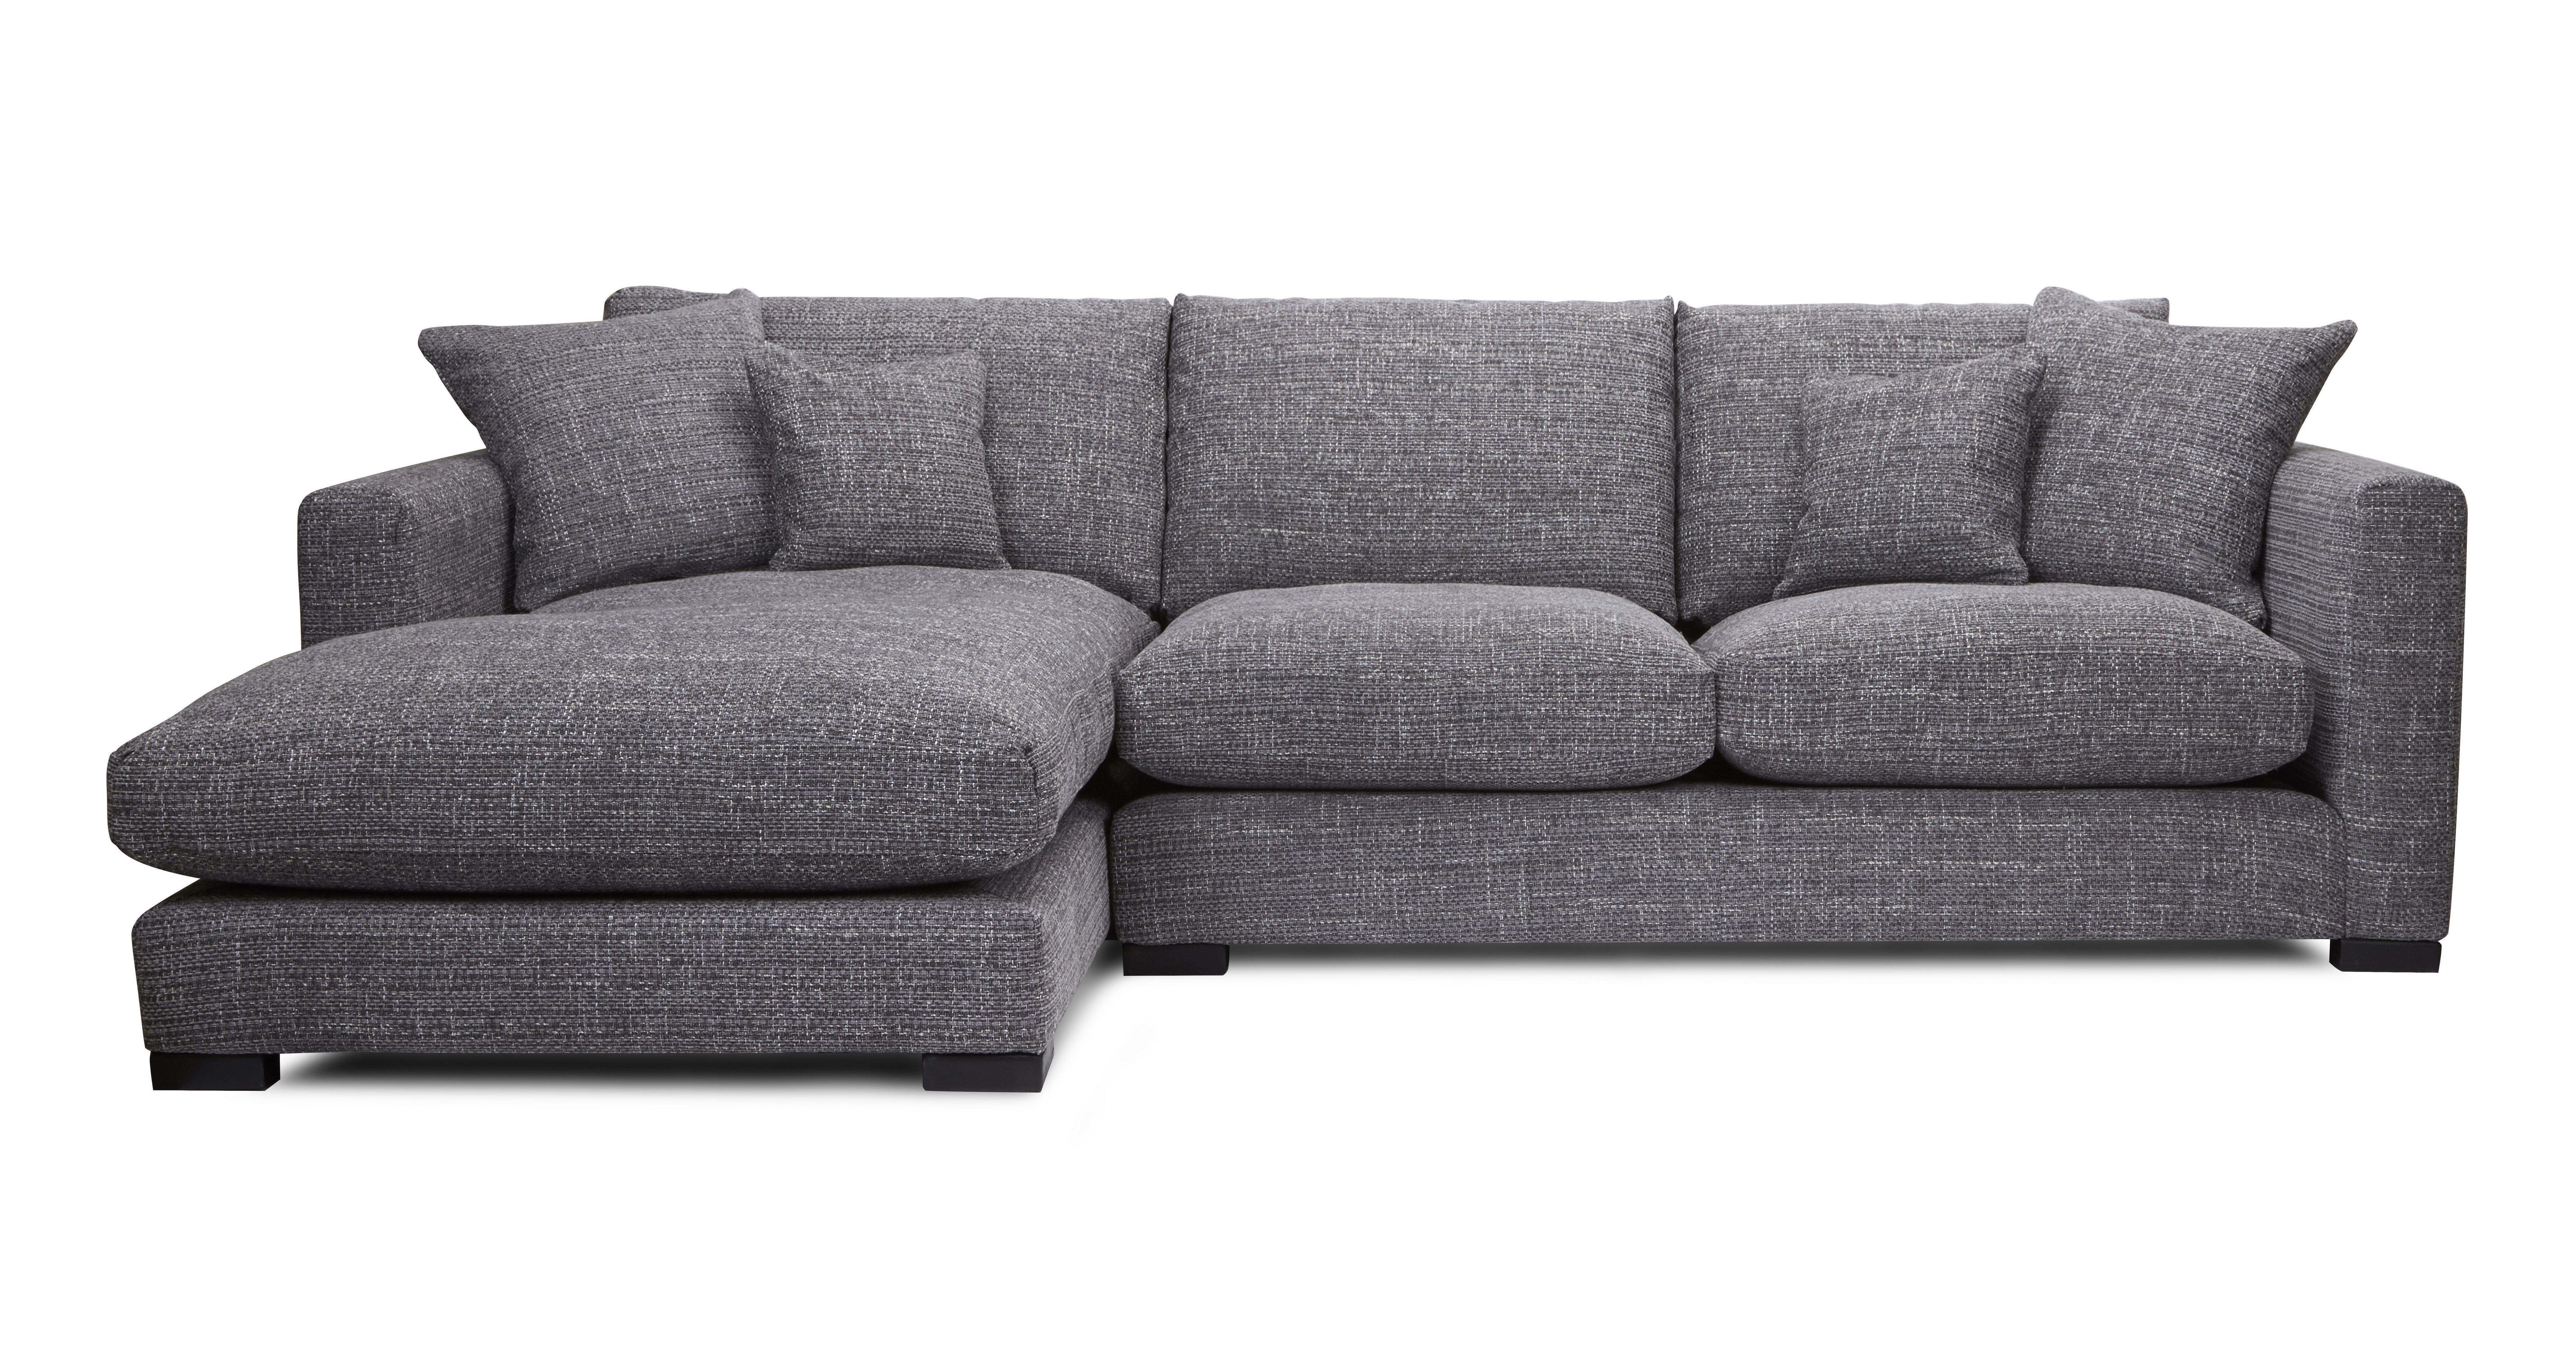 Dillon linkszijdige chaise kleine hoekbank dfs banken - Sofa kleine ruimte ...